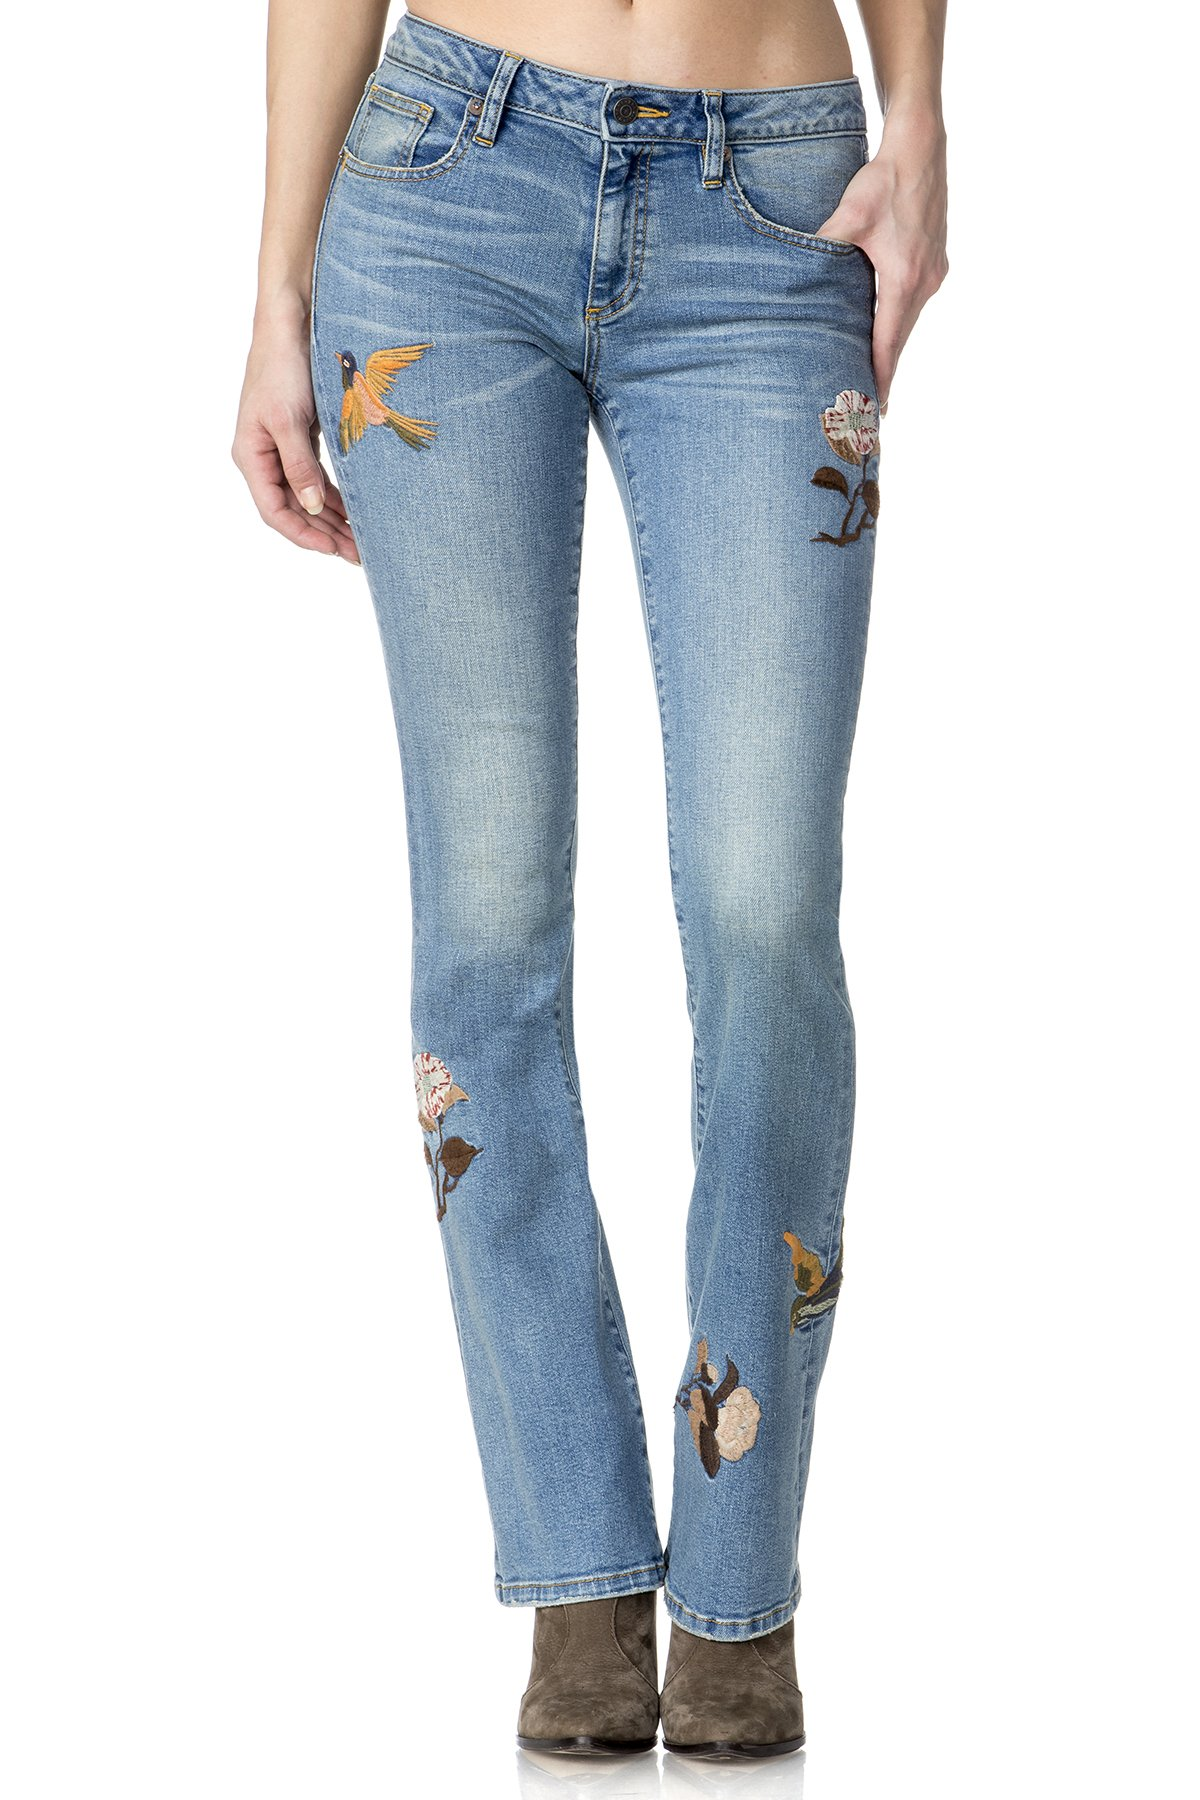 Miss Me Womens Like Woah Mid-Rise Boot Cut Jean 31 Medium Blue